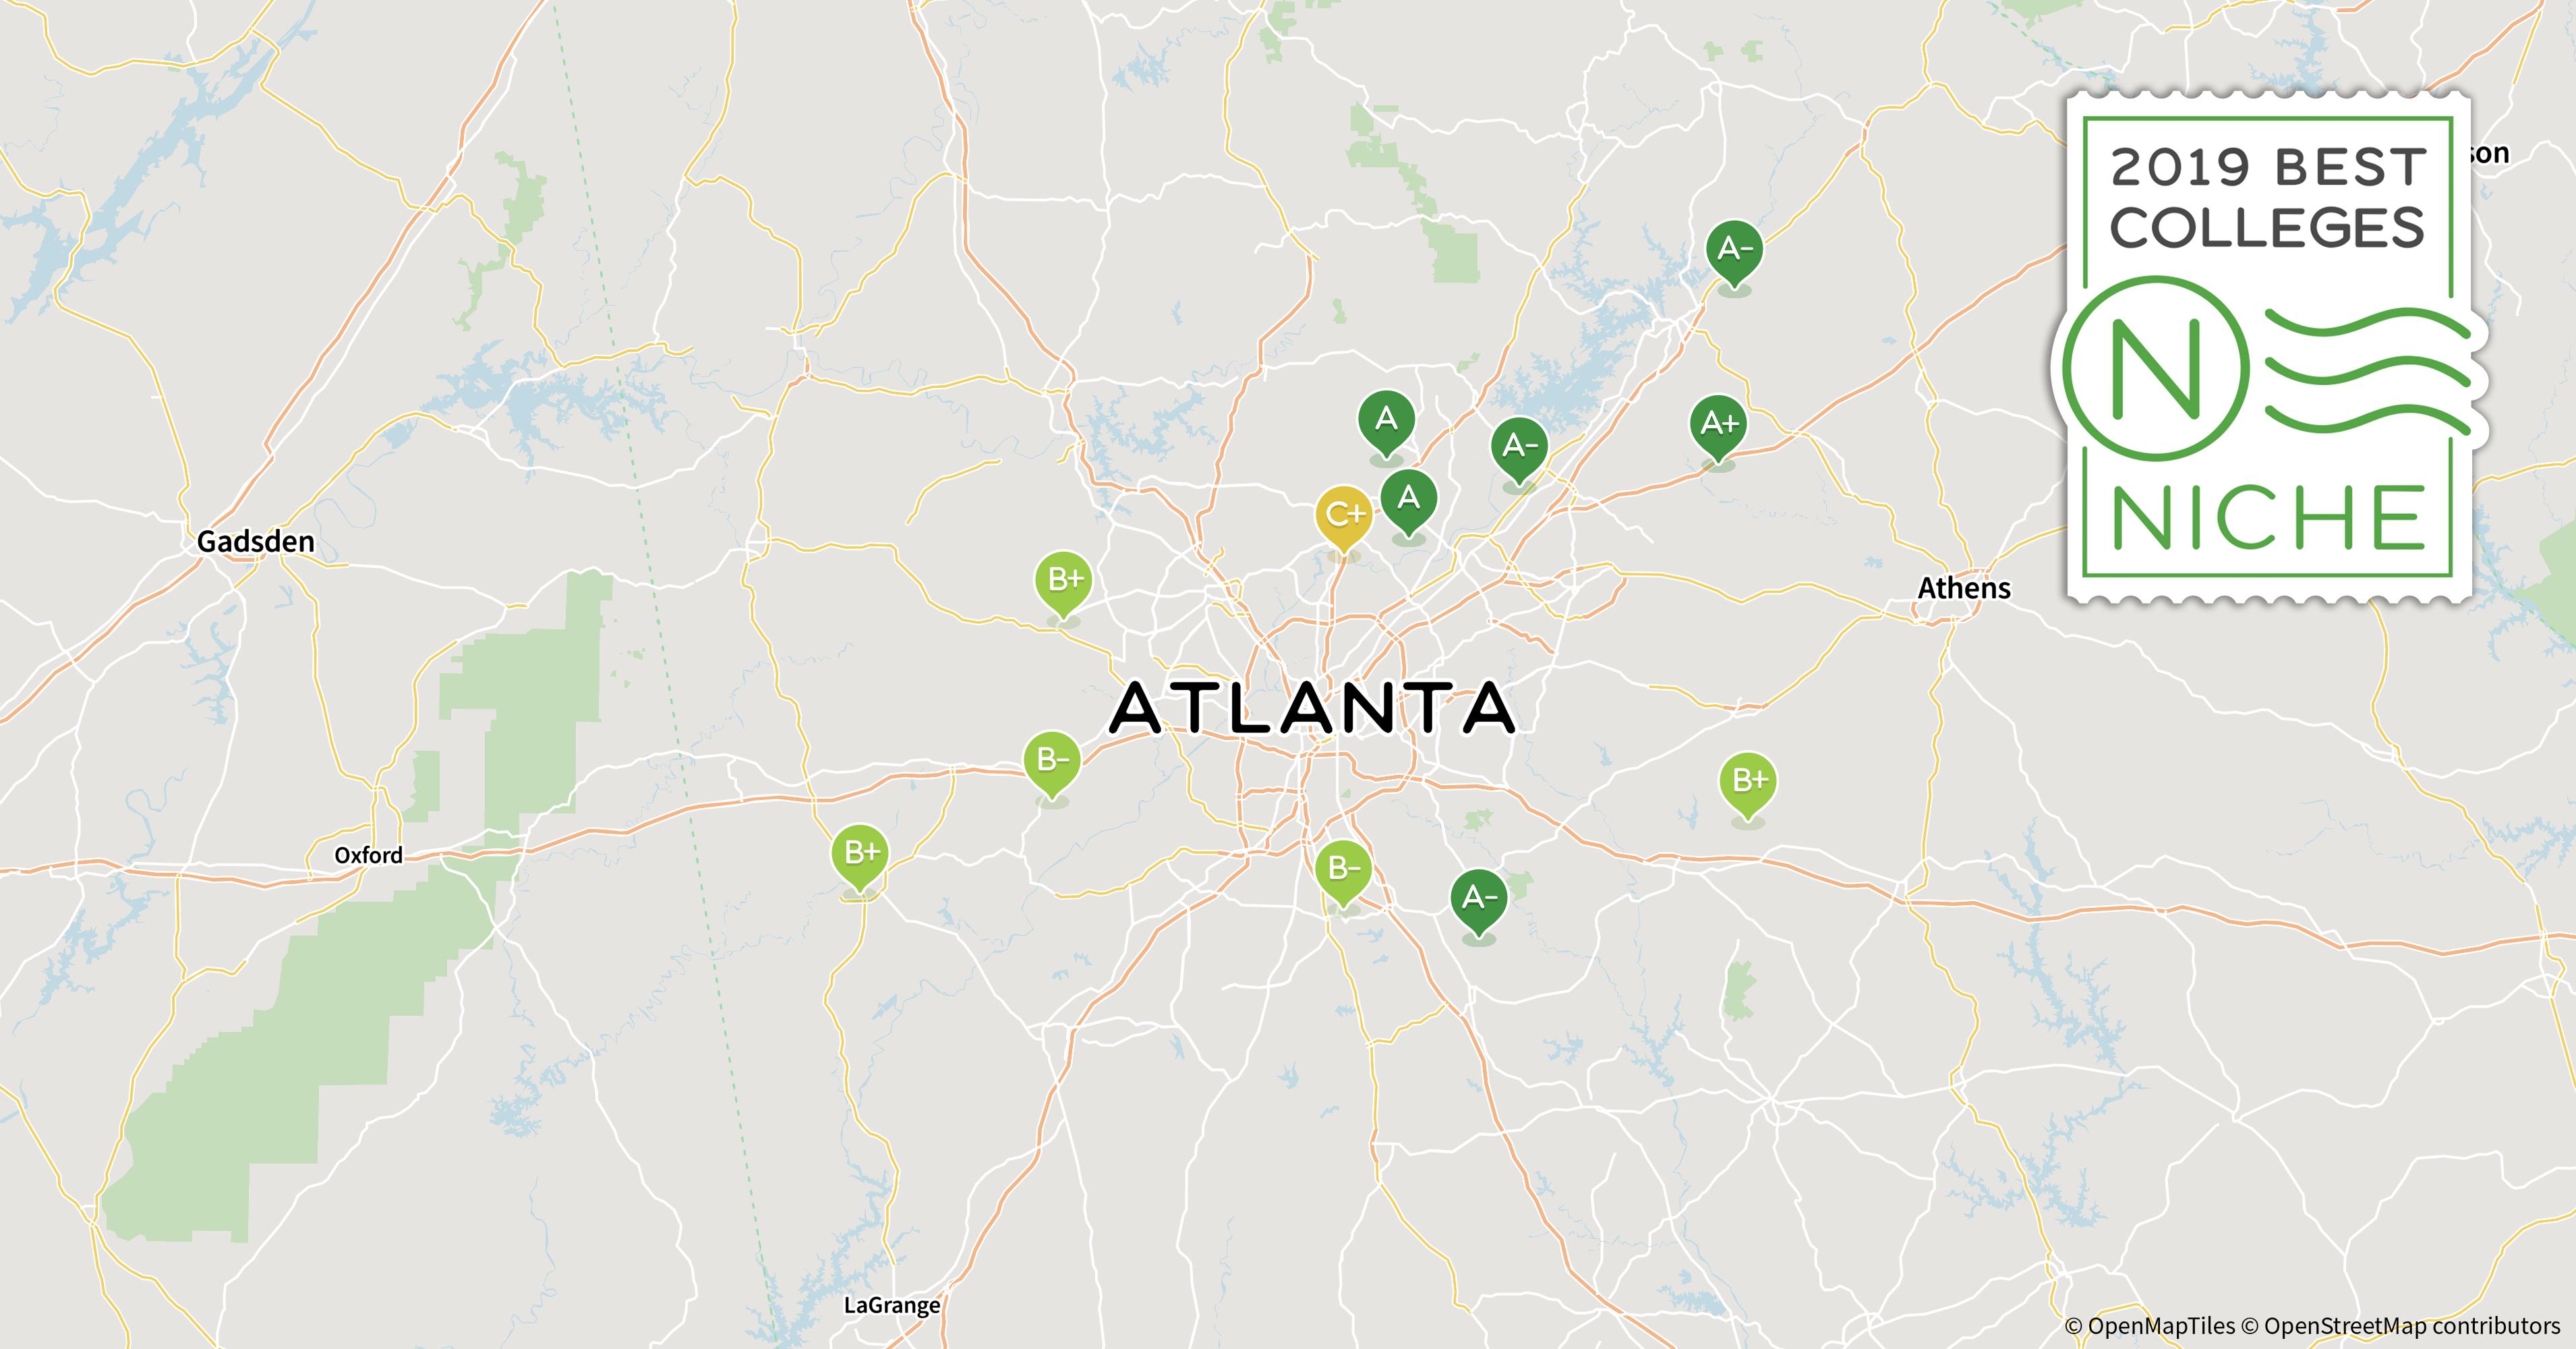 Map Of Georgia Universities.2019 Top Graduate Programs In The Atlanta Area Niche